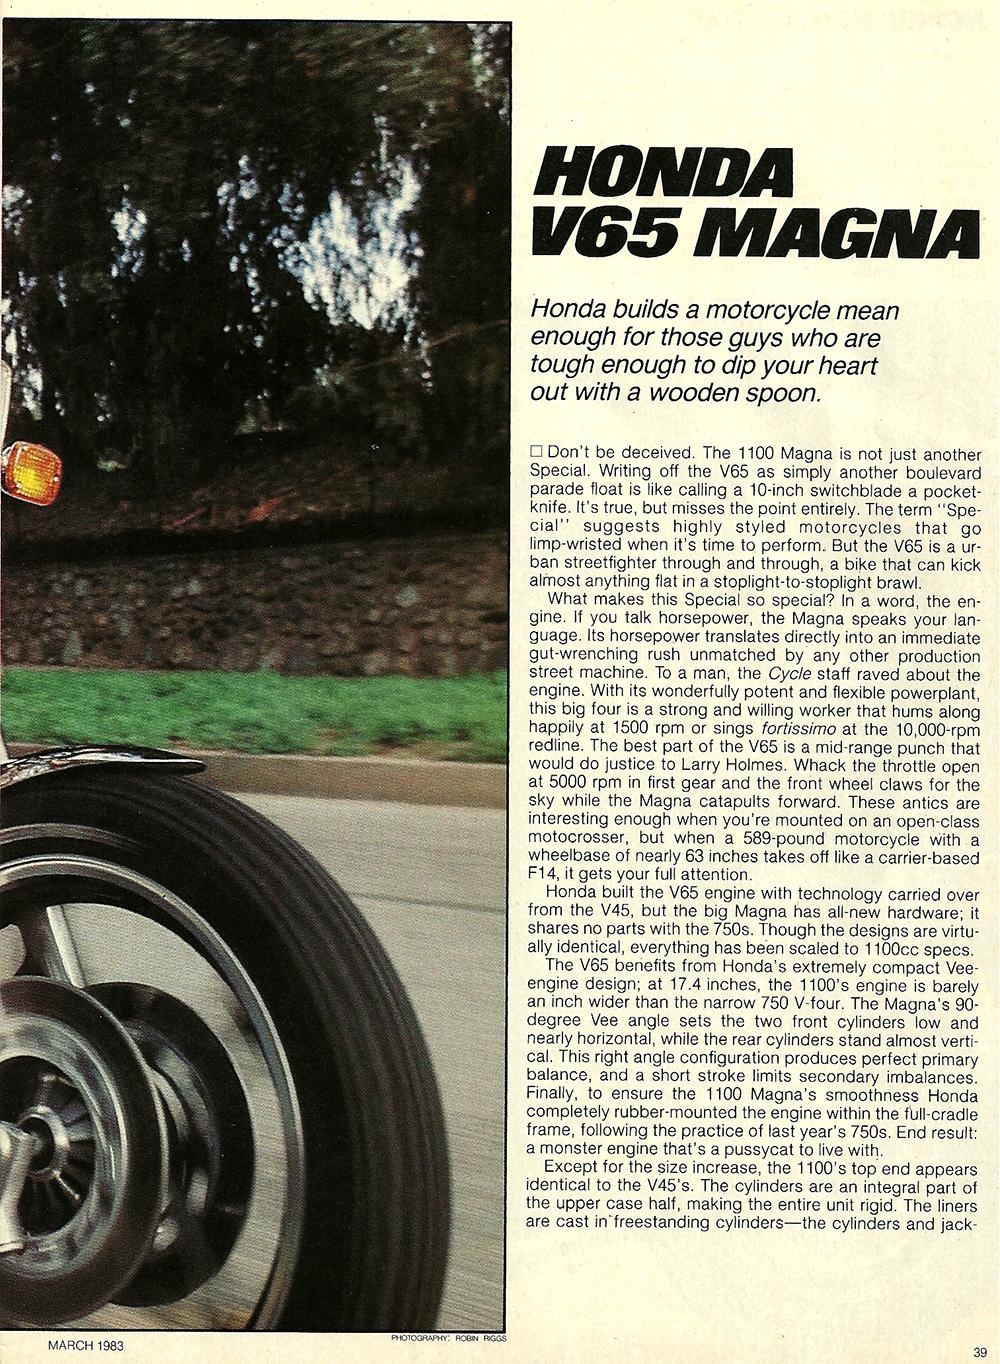 1983 Honda V65 Magna road test 2.jpg